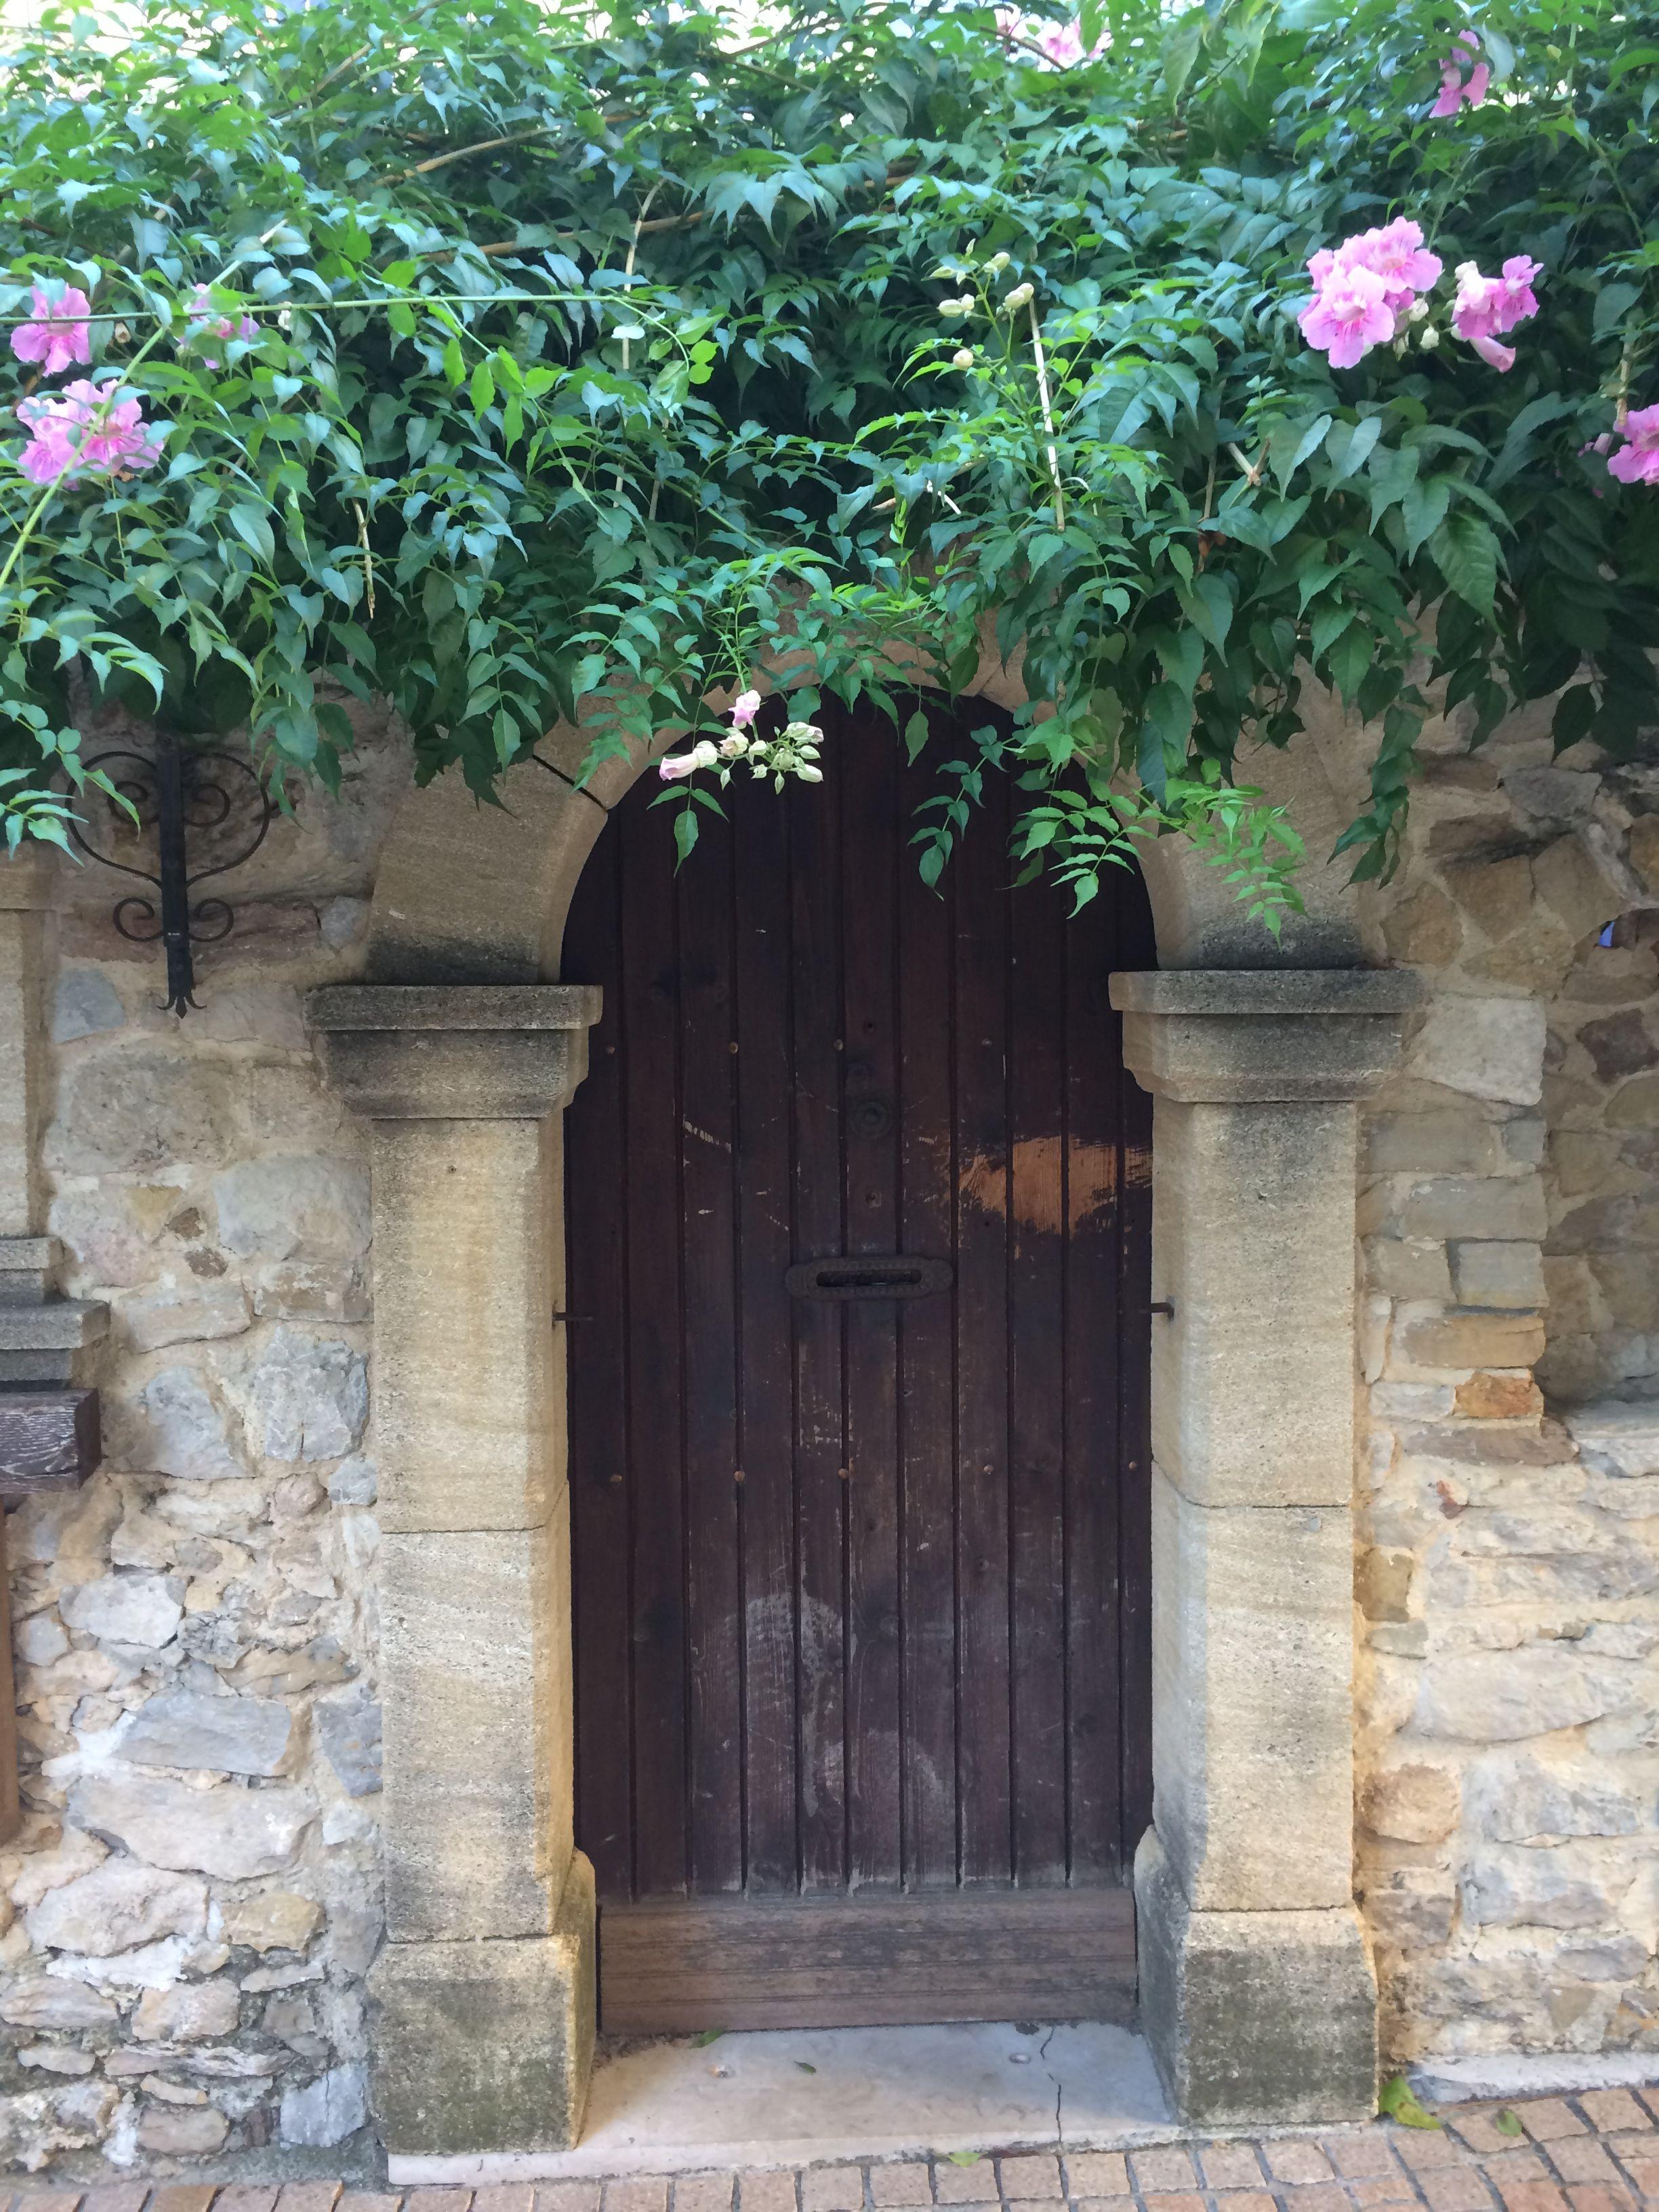 Le Castellet Franca Como E Bom Viajar Portas Janelas E Viajar